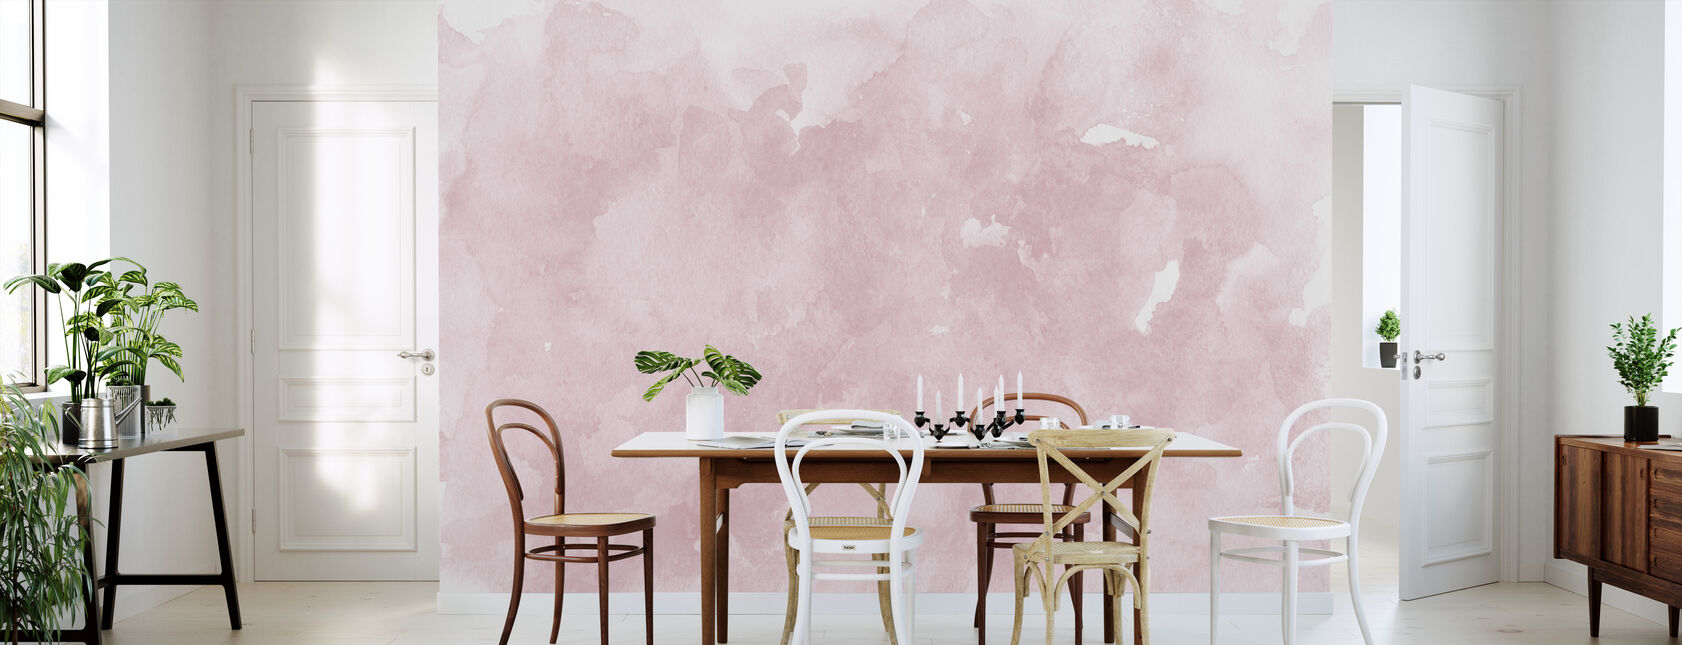 Watercolor Minimalism XI - Wallpaper - Kitchen